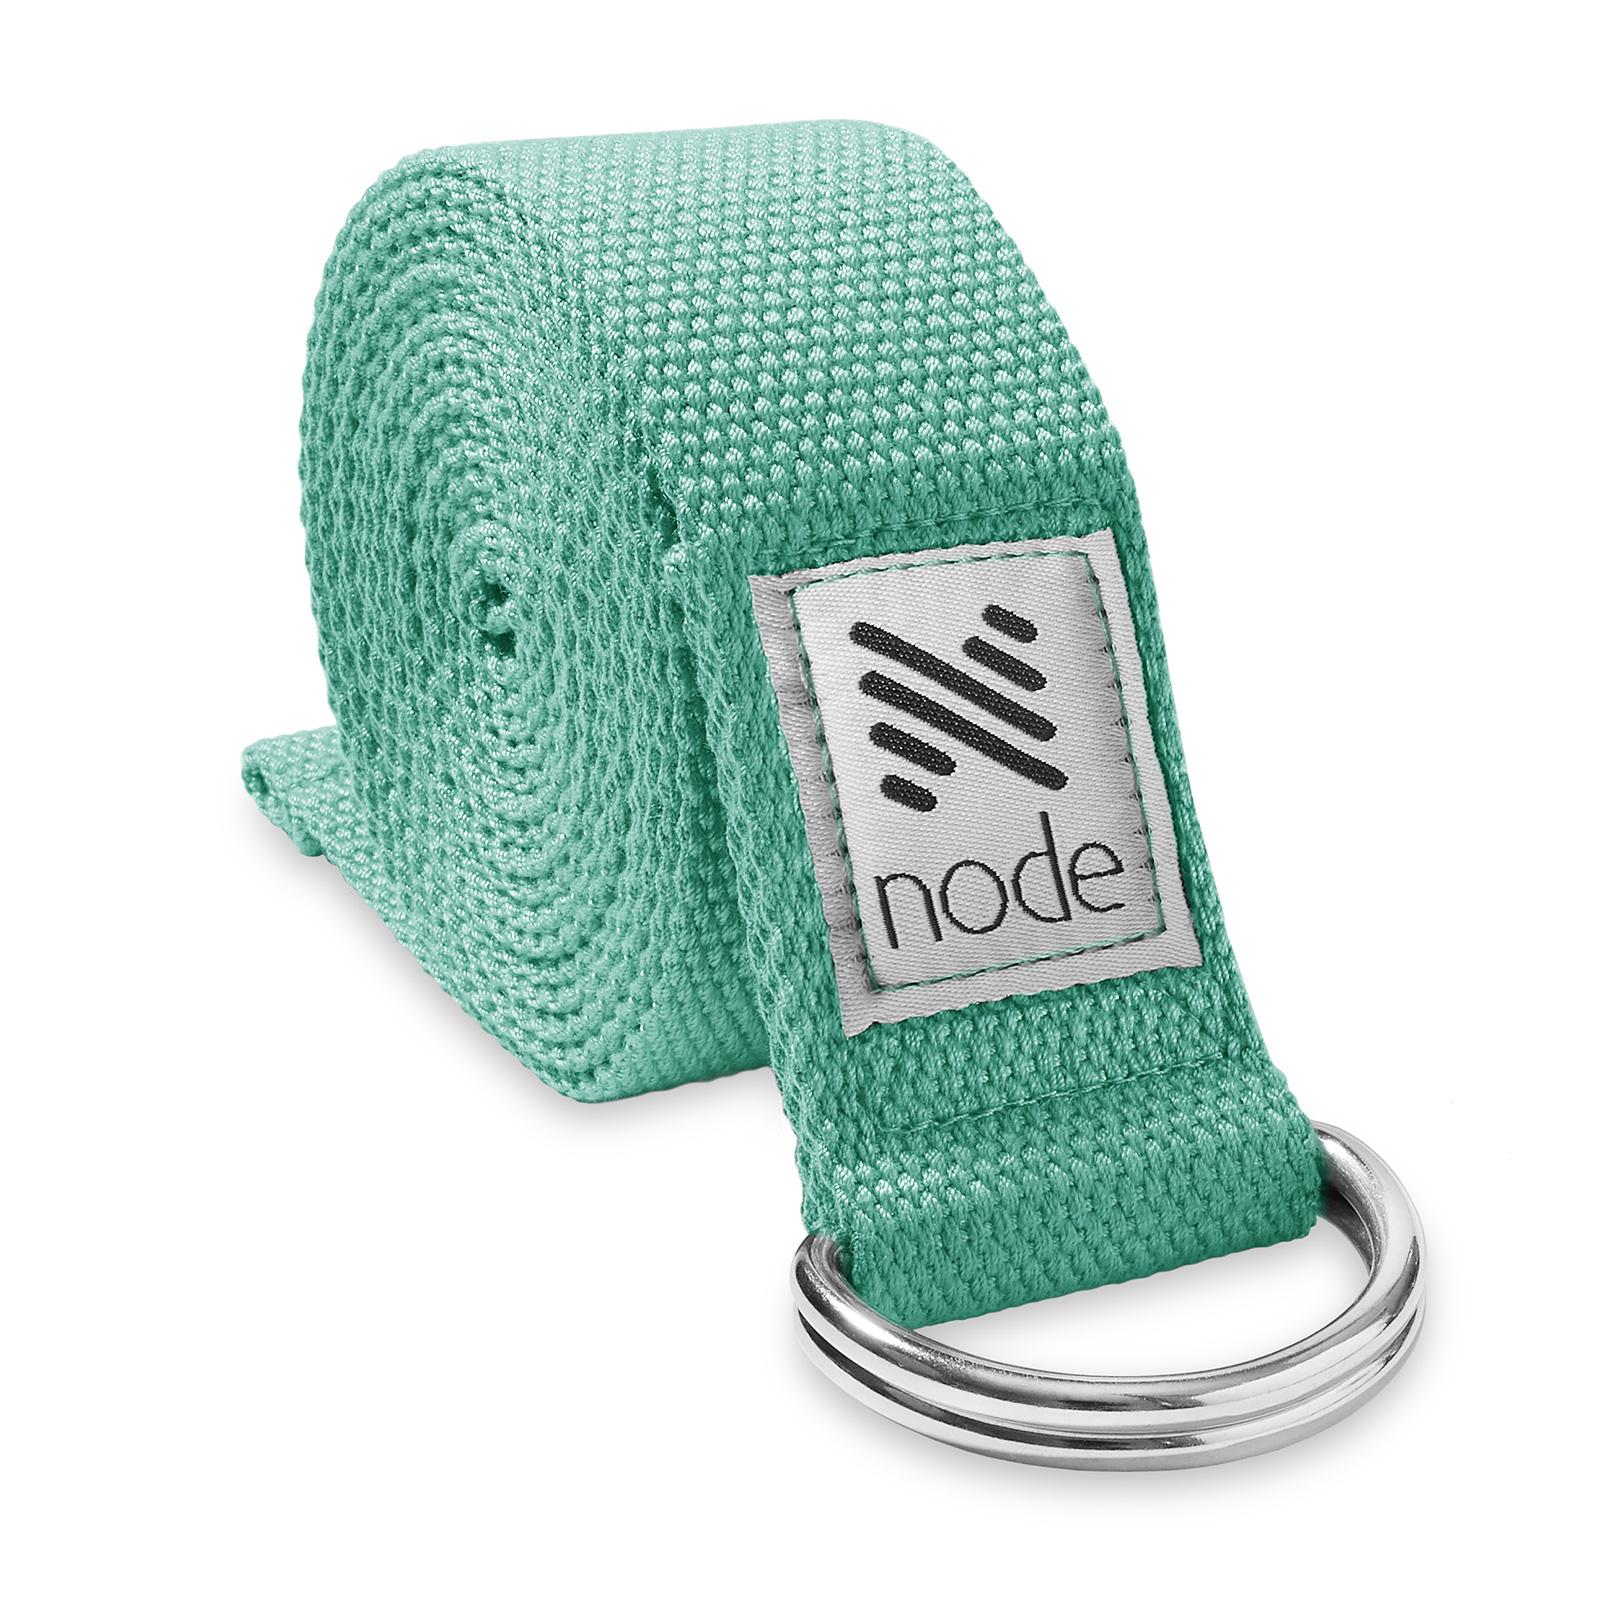 7-1-2-039-Woven-Cotton-Blend-Yoga-Strap-Stretching-Exercise-Prop-Belt thumbnail 33